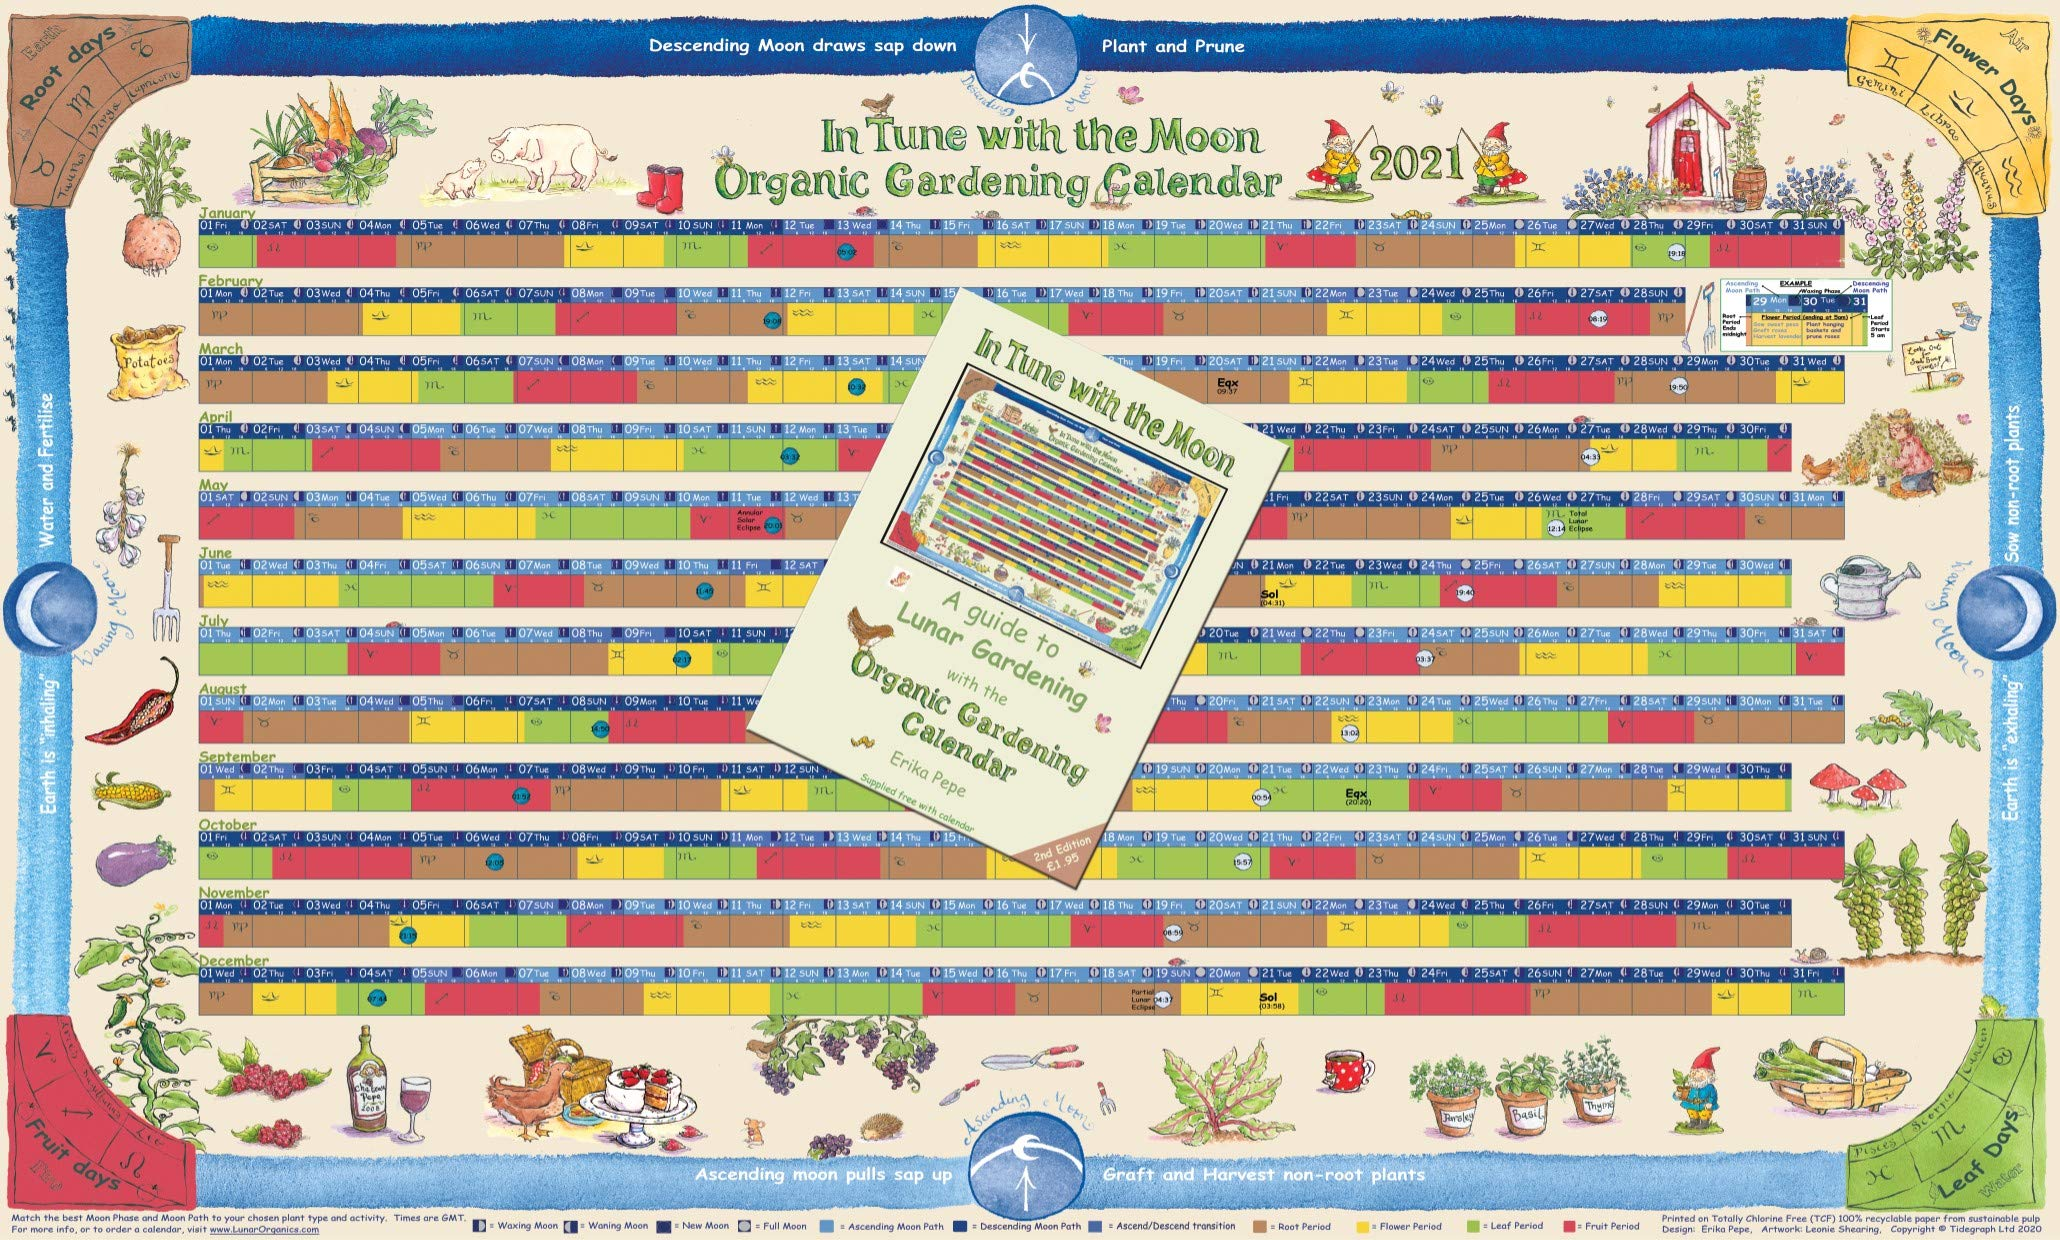 Moon Planting Calendar 2022.Moon Gardening Calendar 2021 With Lunar Gardening Guide Booklet Buy Online In India At Desertcart In Productid 50171619